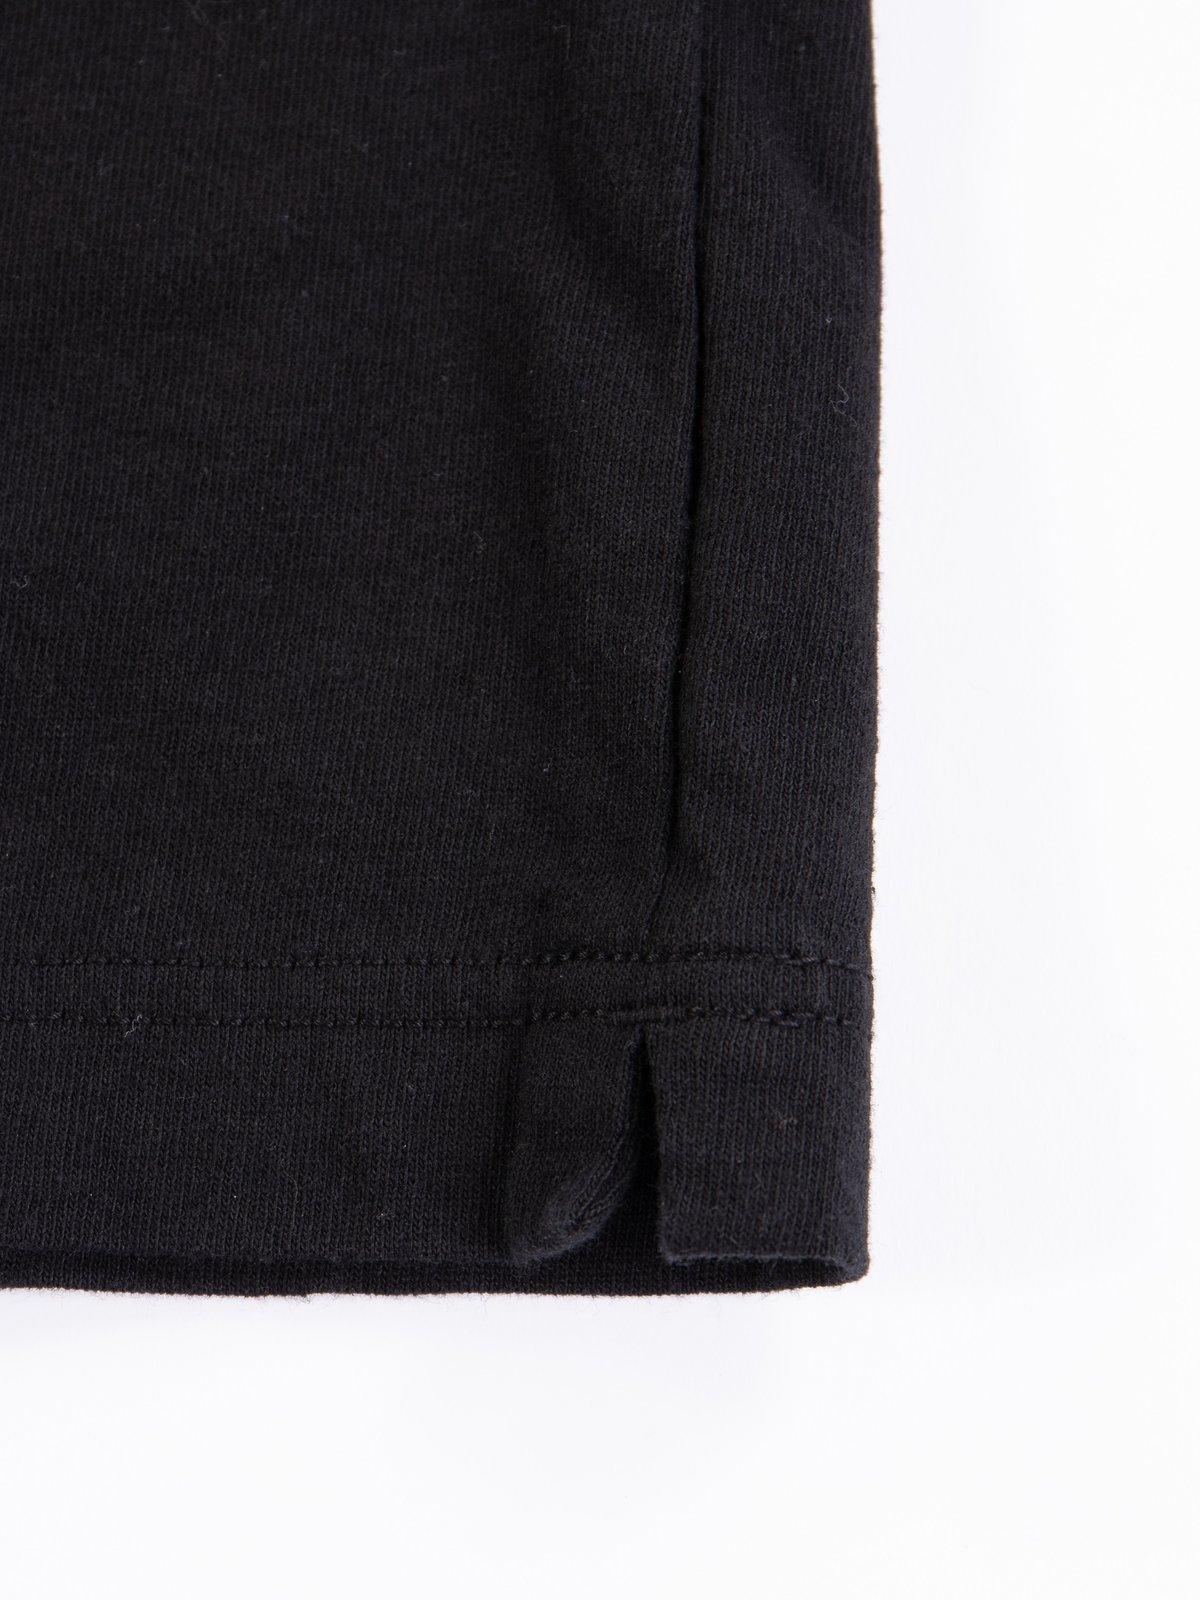 Black Henley T–Shirt - Image 5